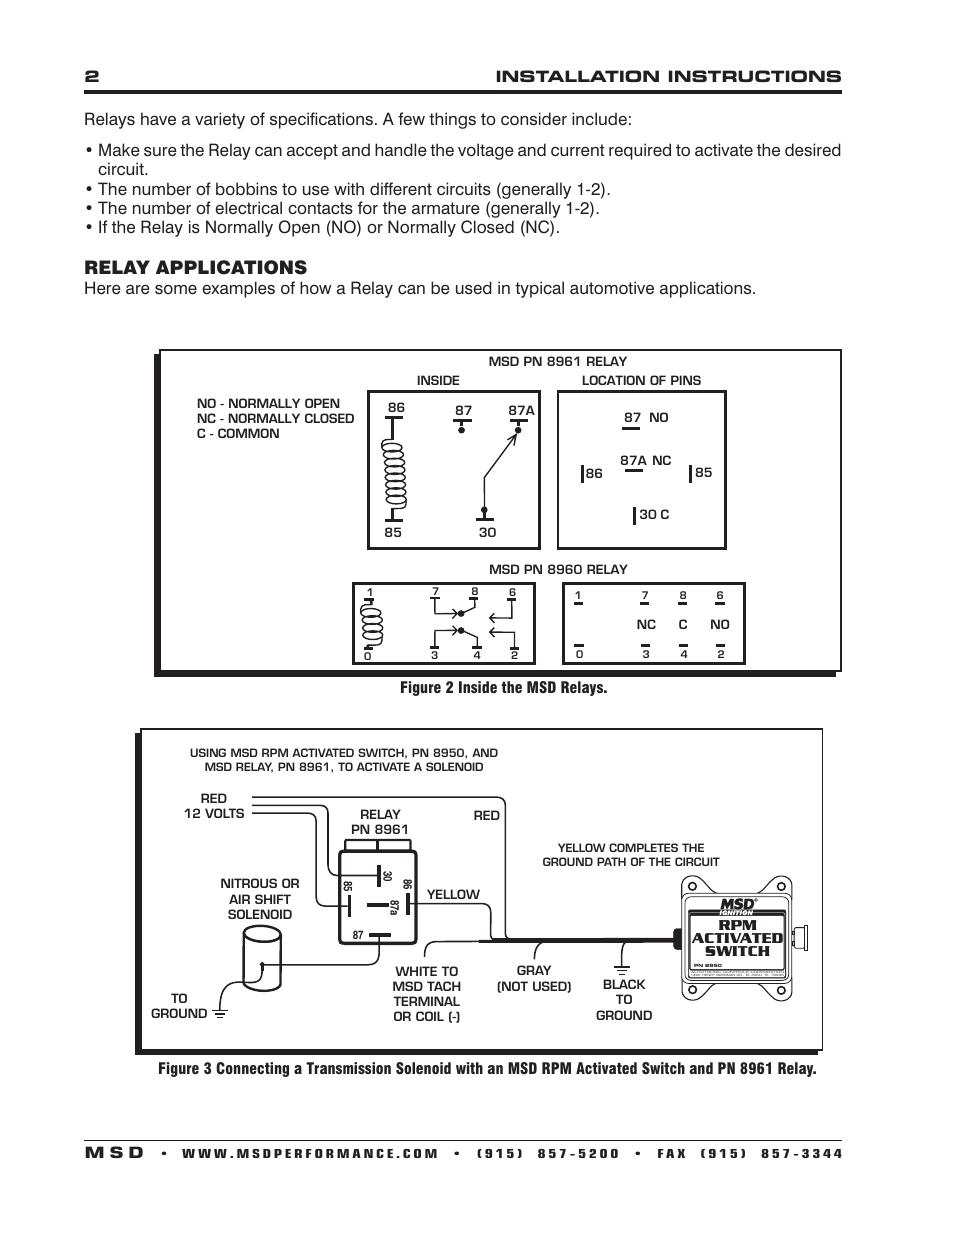 msd rpm switch wiring diagram relay applications msd 8961 high current relay  spst  msd 8961 high current relay  spst